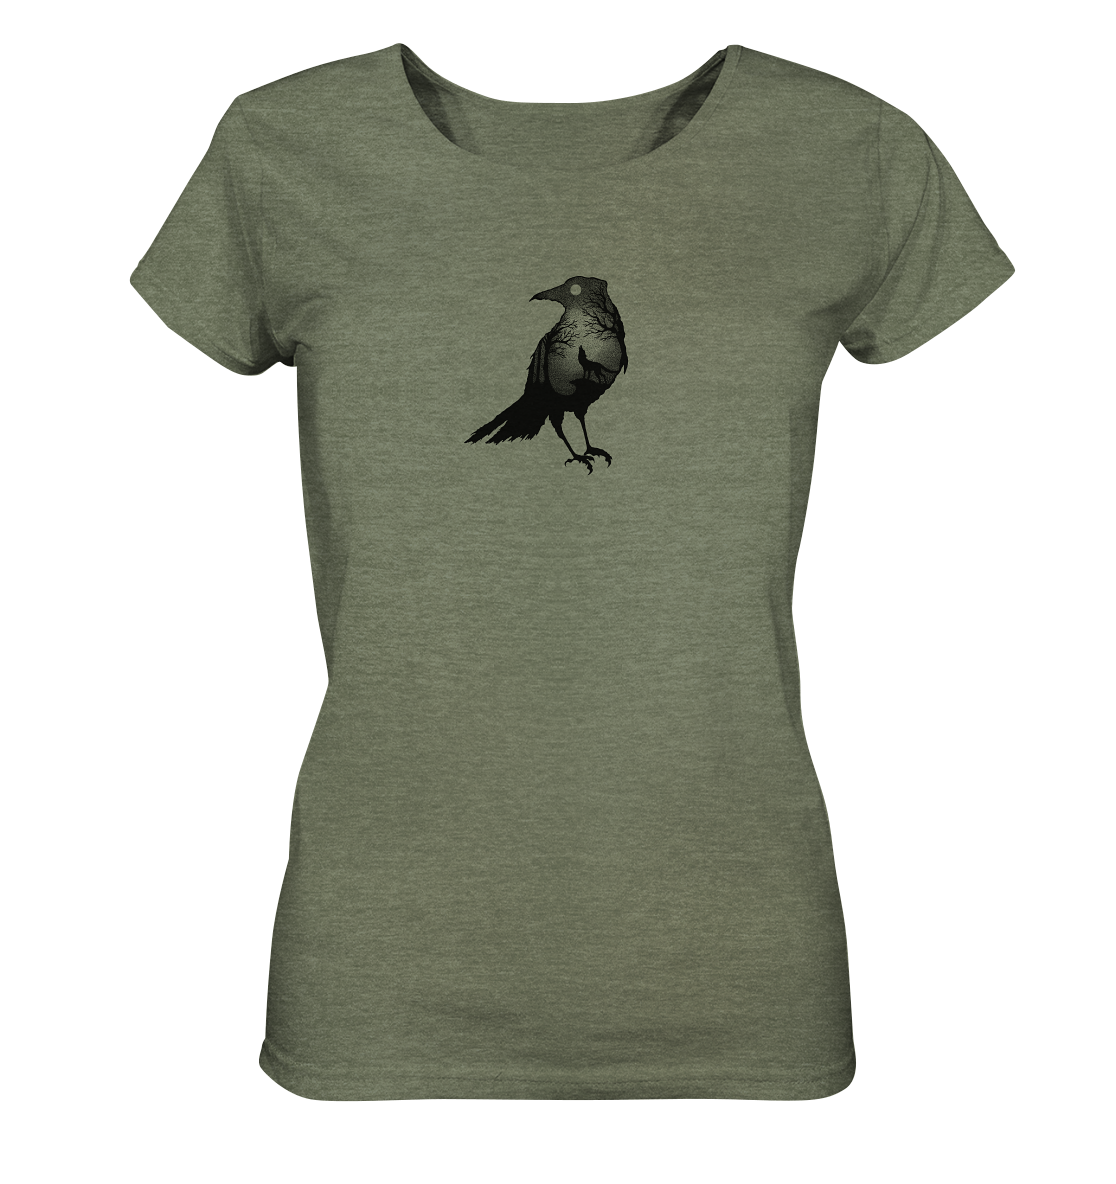 front-ladies-organic-shirt-meliert-616b52-1116x-3.png